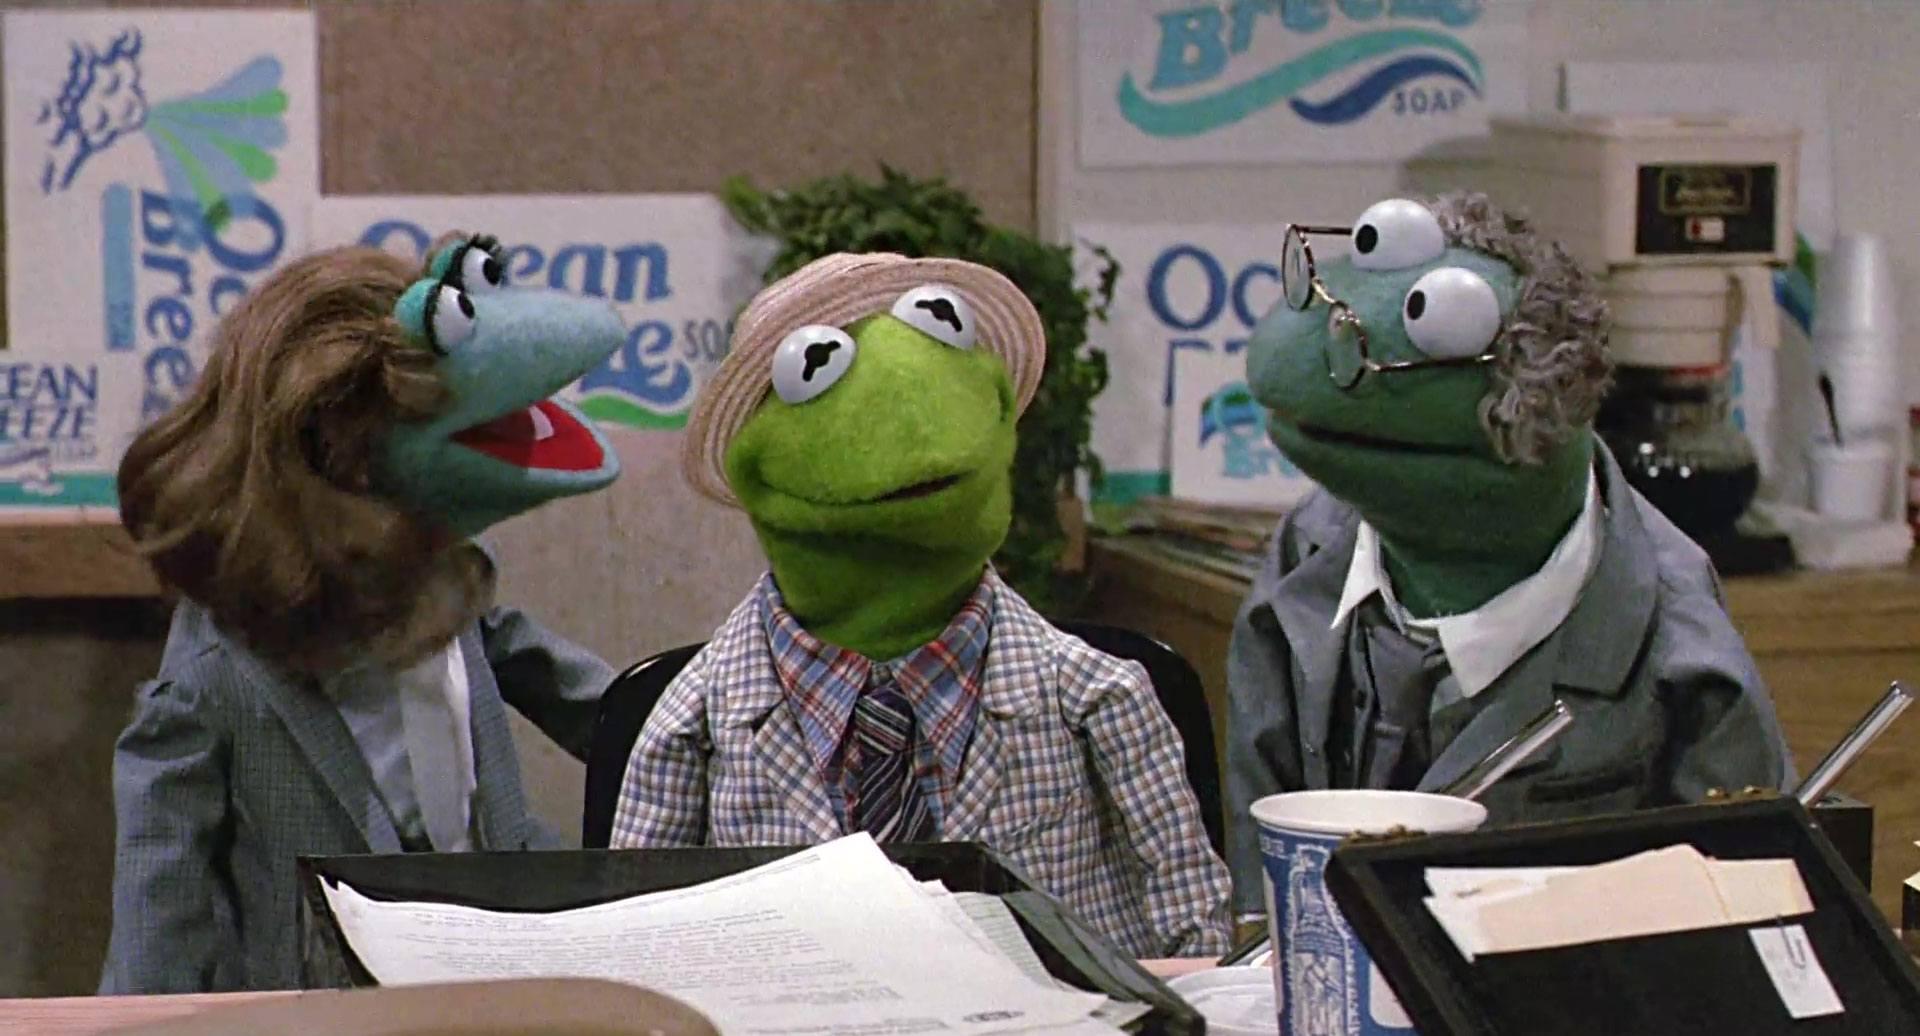 image muppets manhattan disney